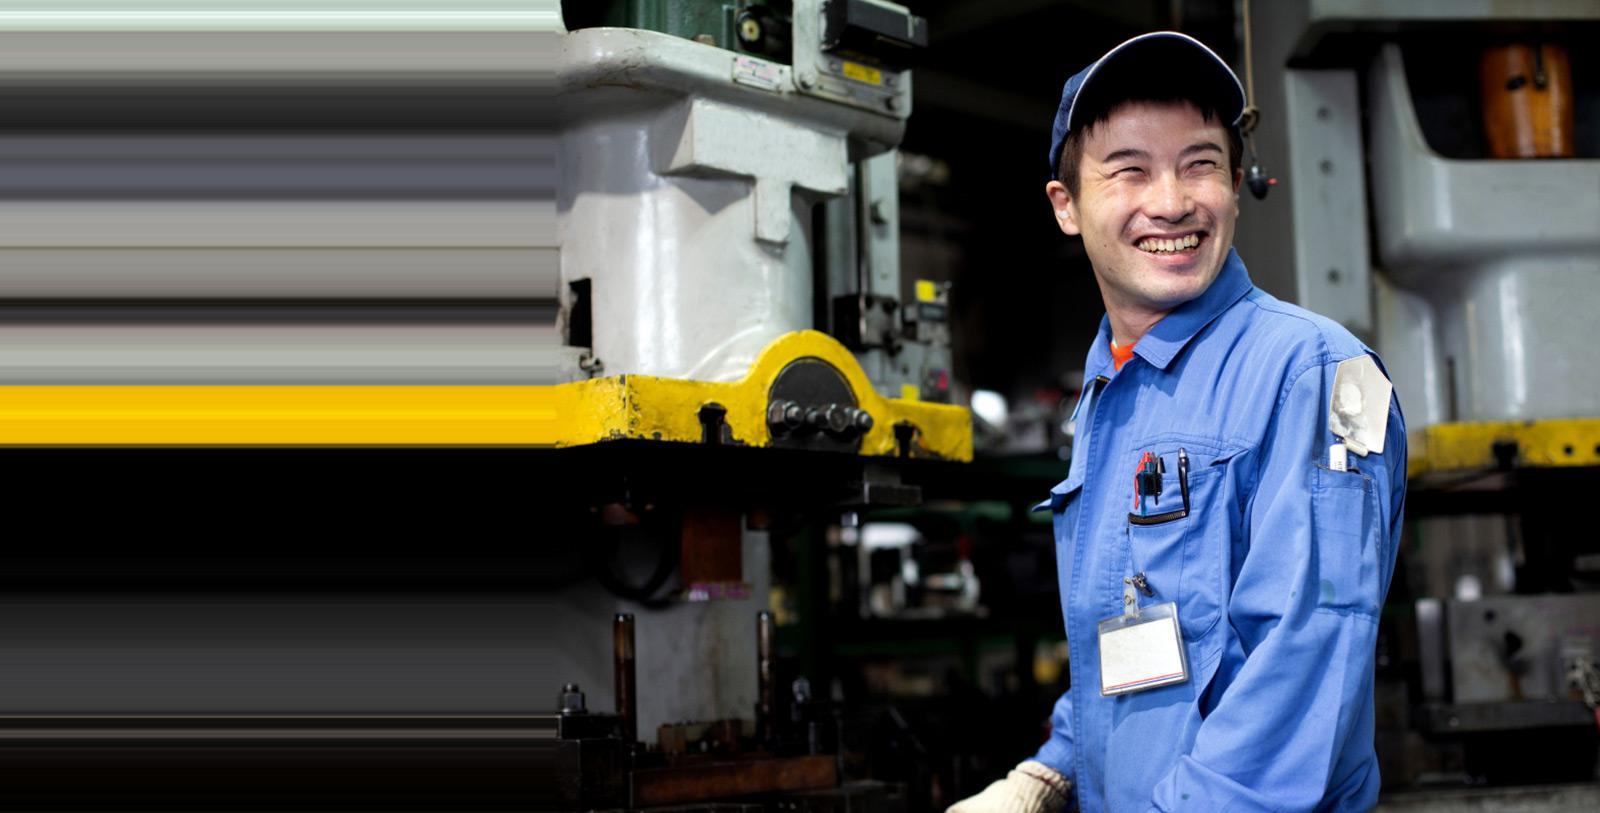 Auto mechanic poses in repair shop